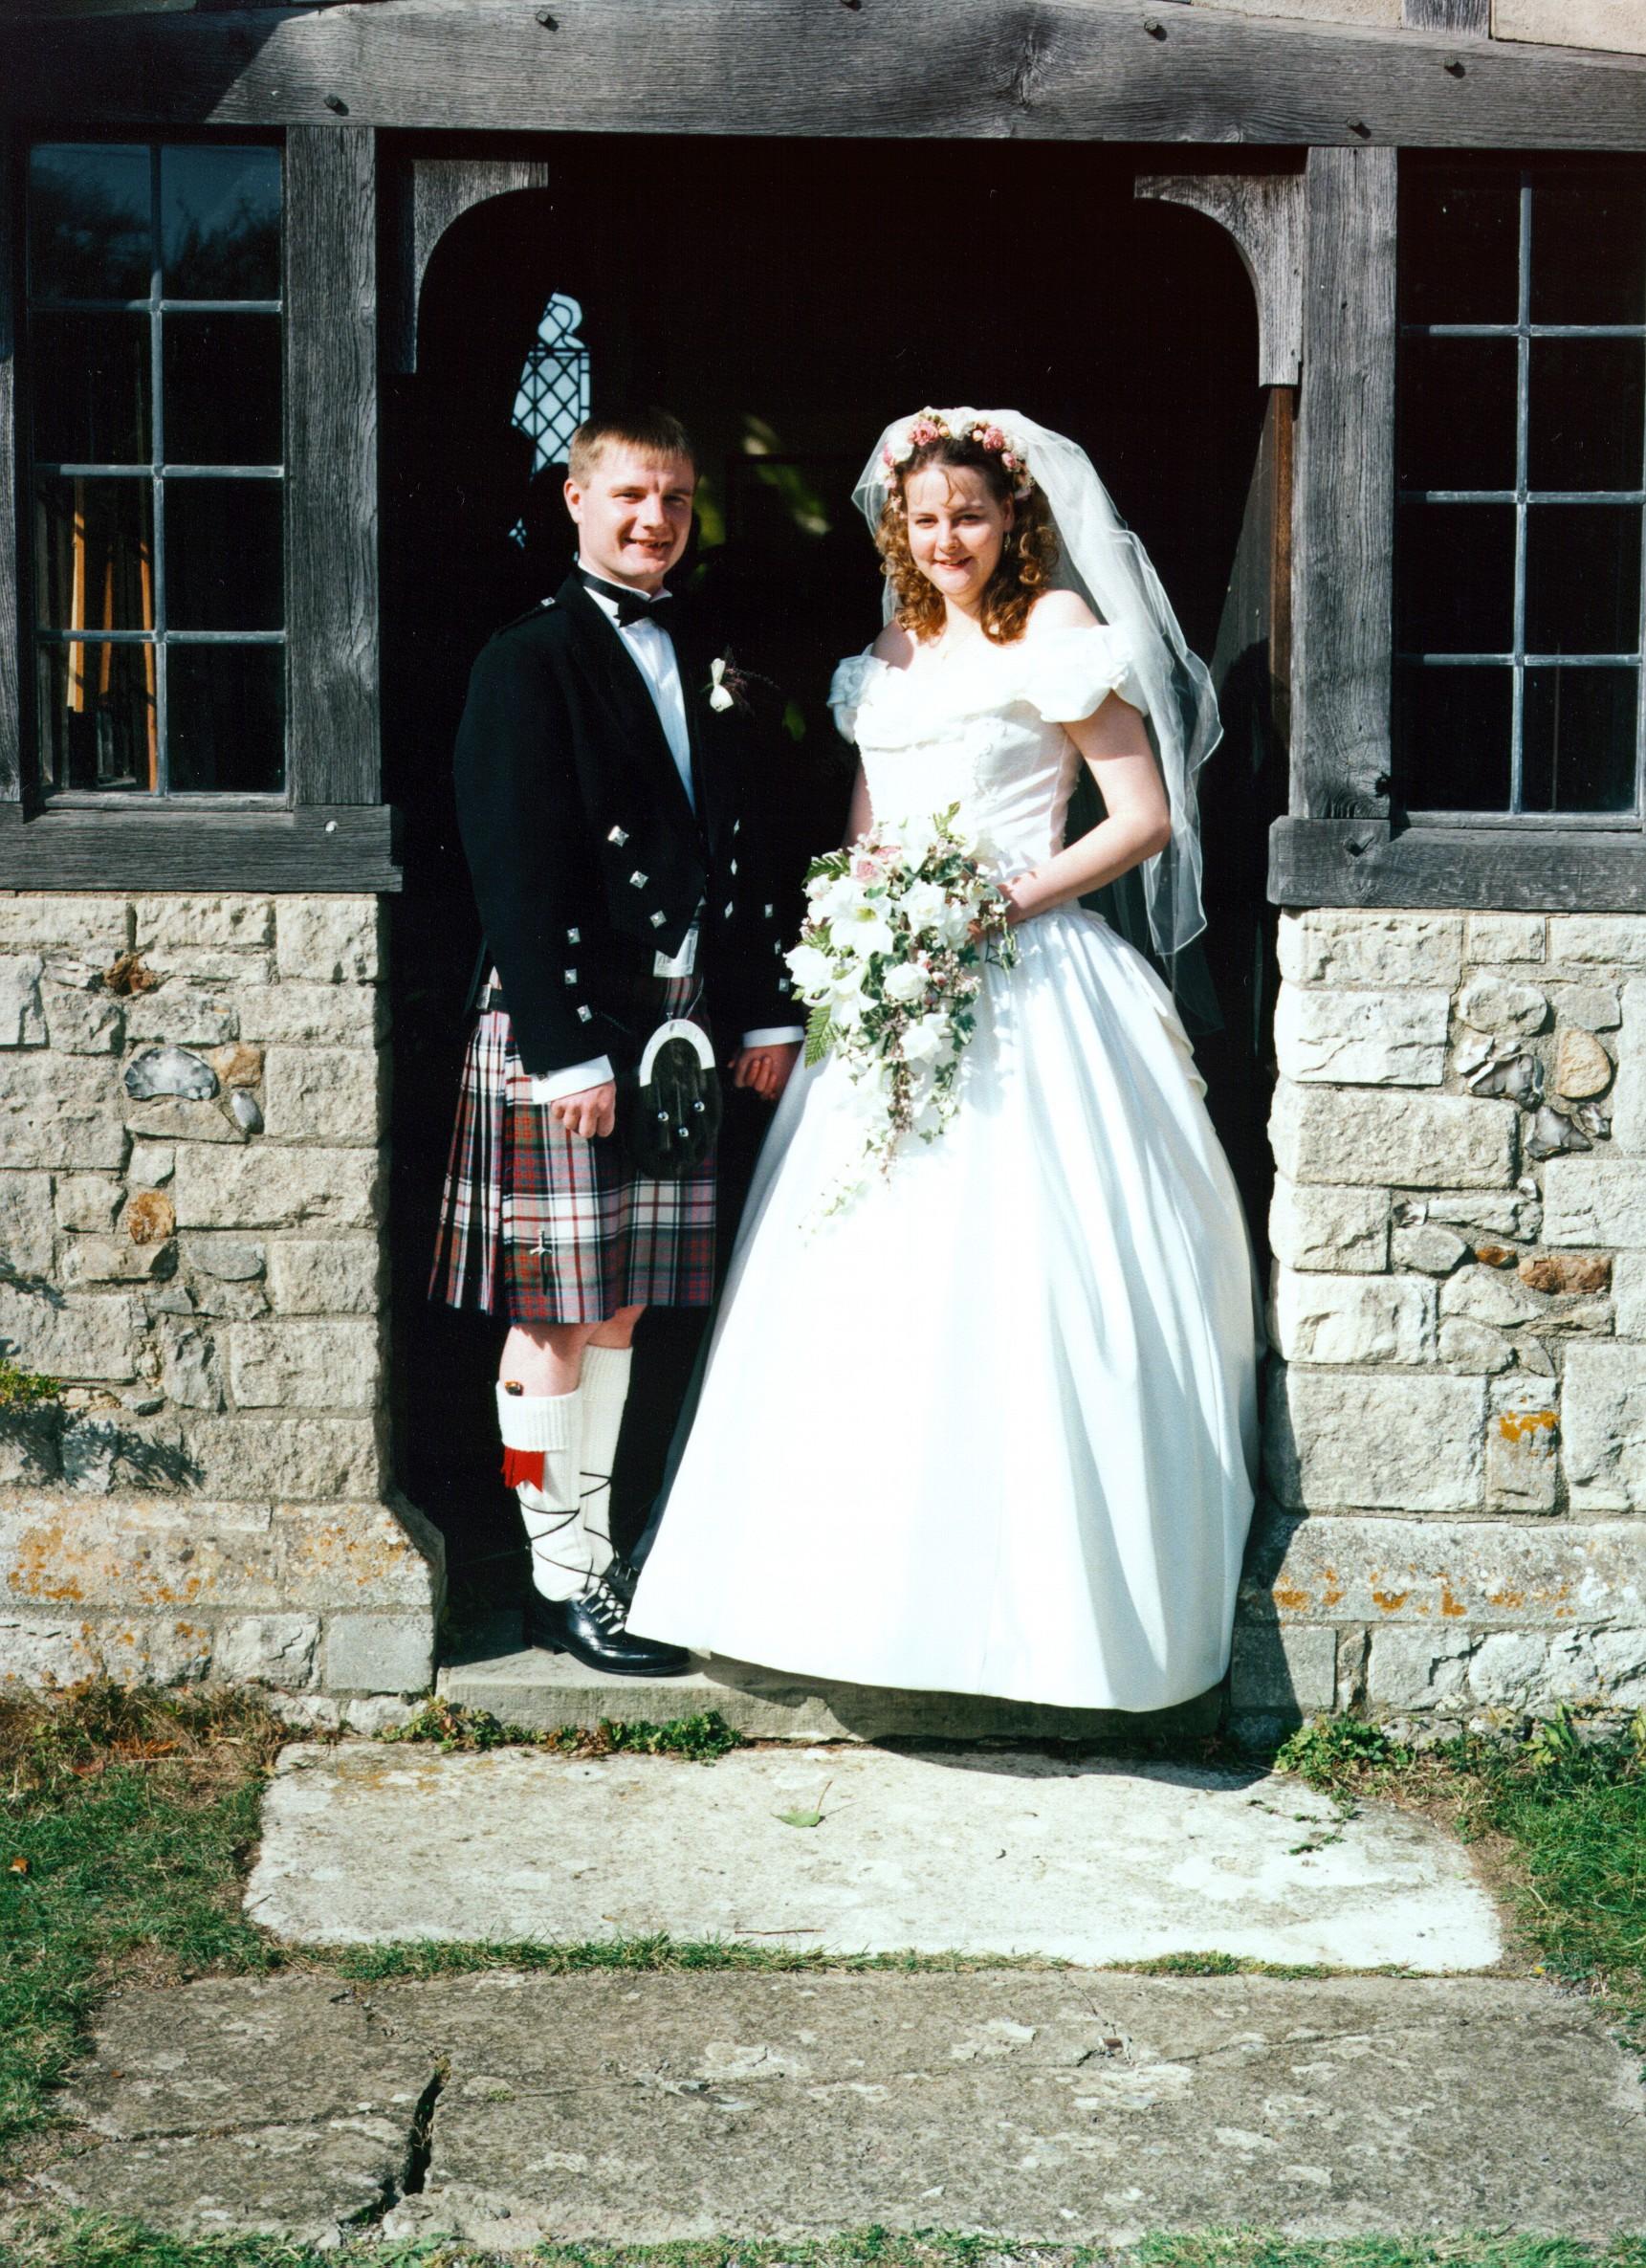 Marriage Simple English Wikipedia The Free Encyclopedia